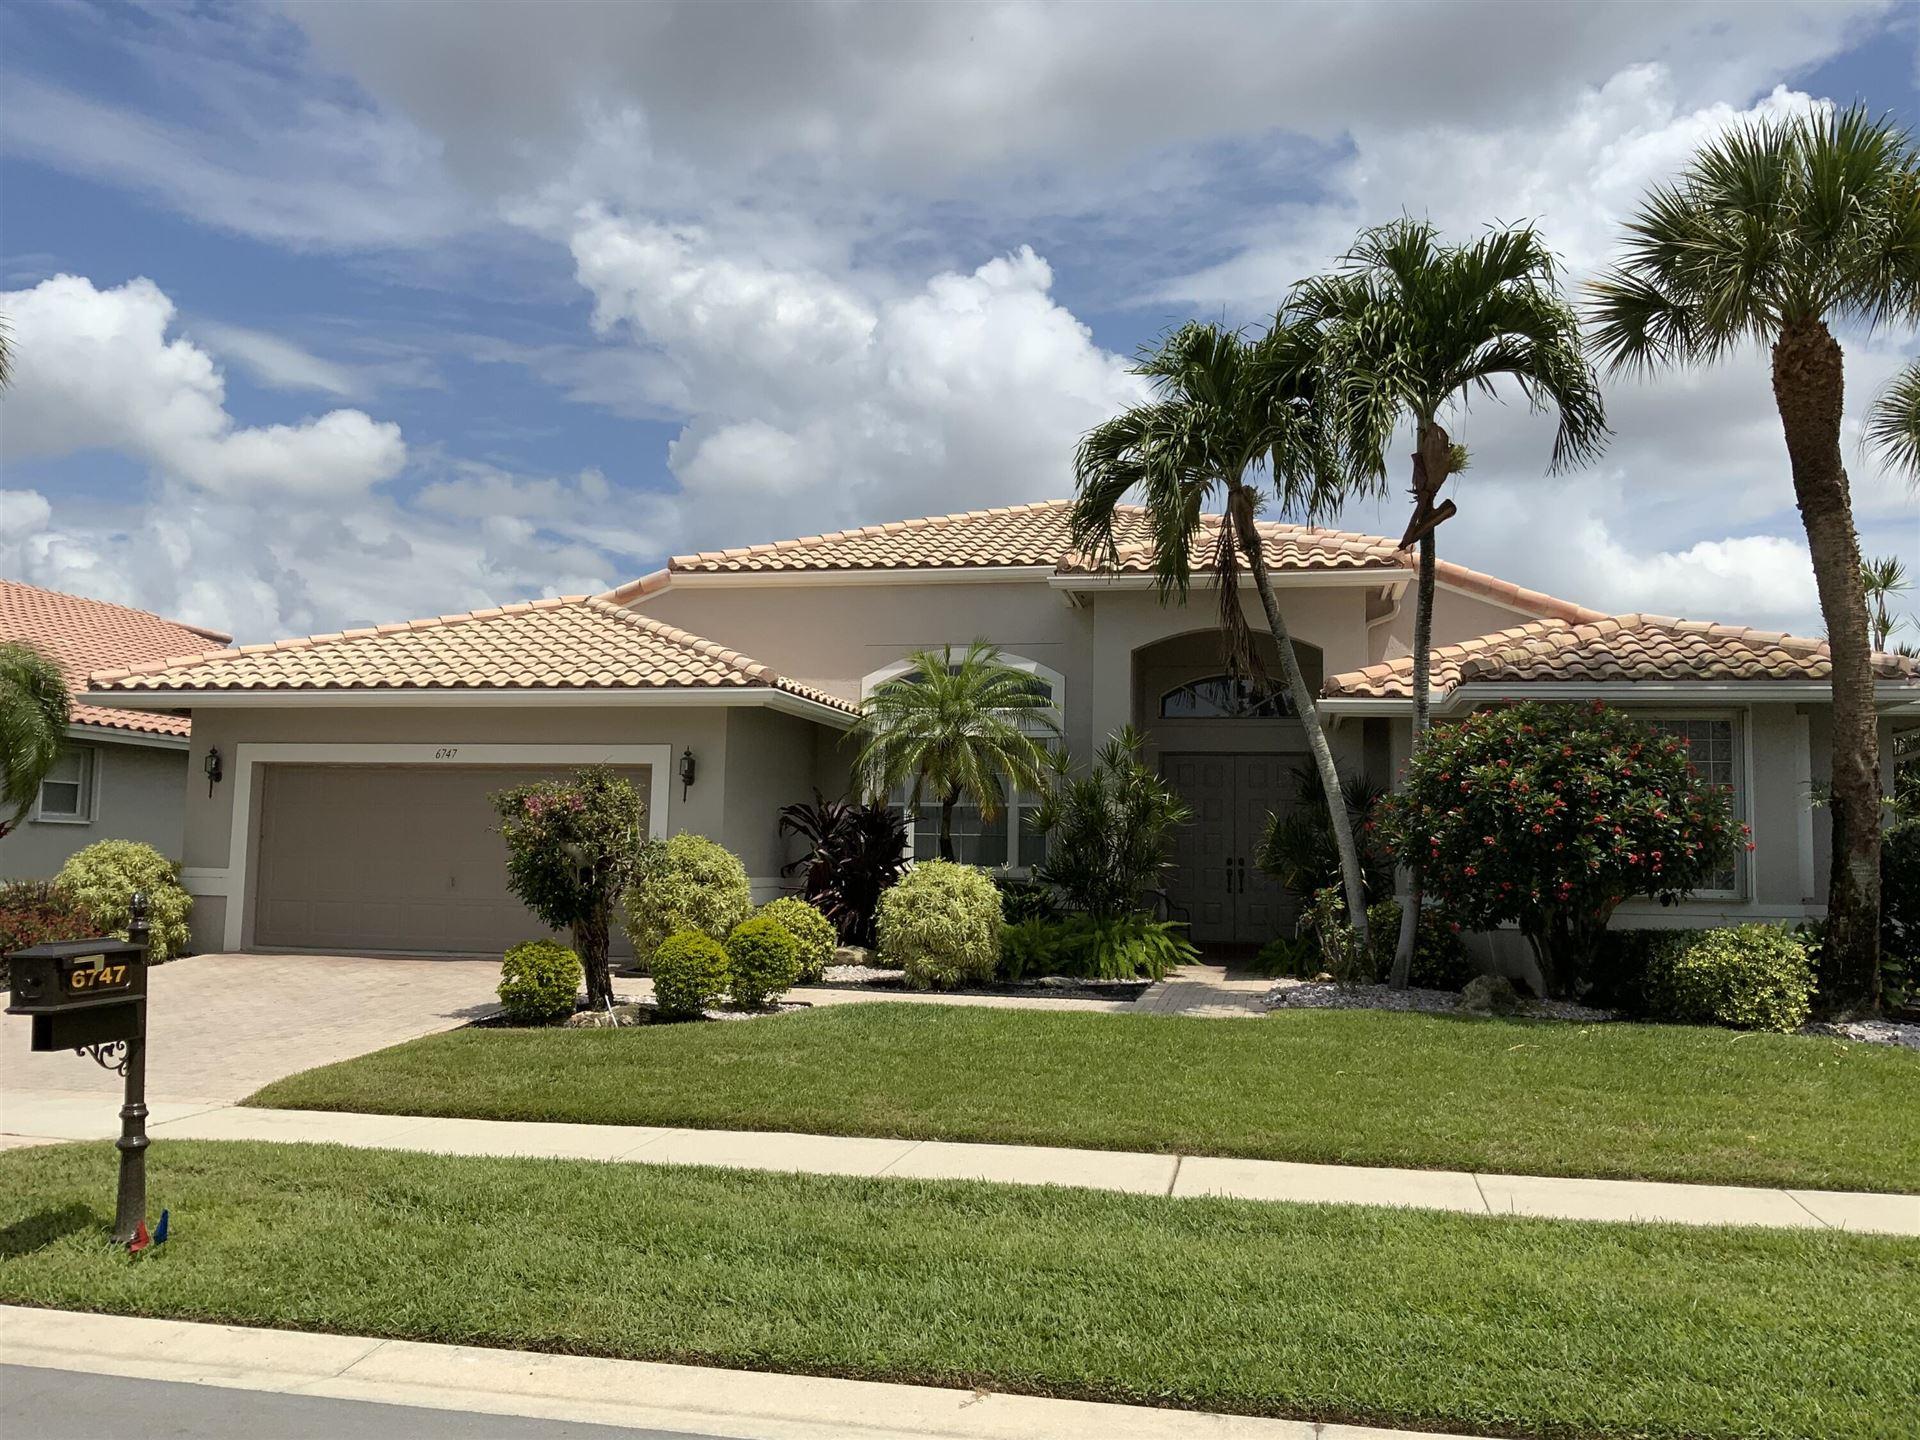 6747 Chimere Terrace, Boynton Beach, FL 33437 - #: RX-10712816